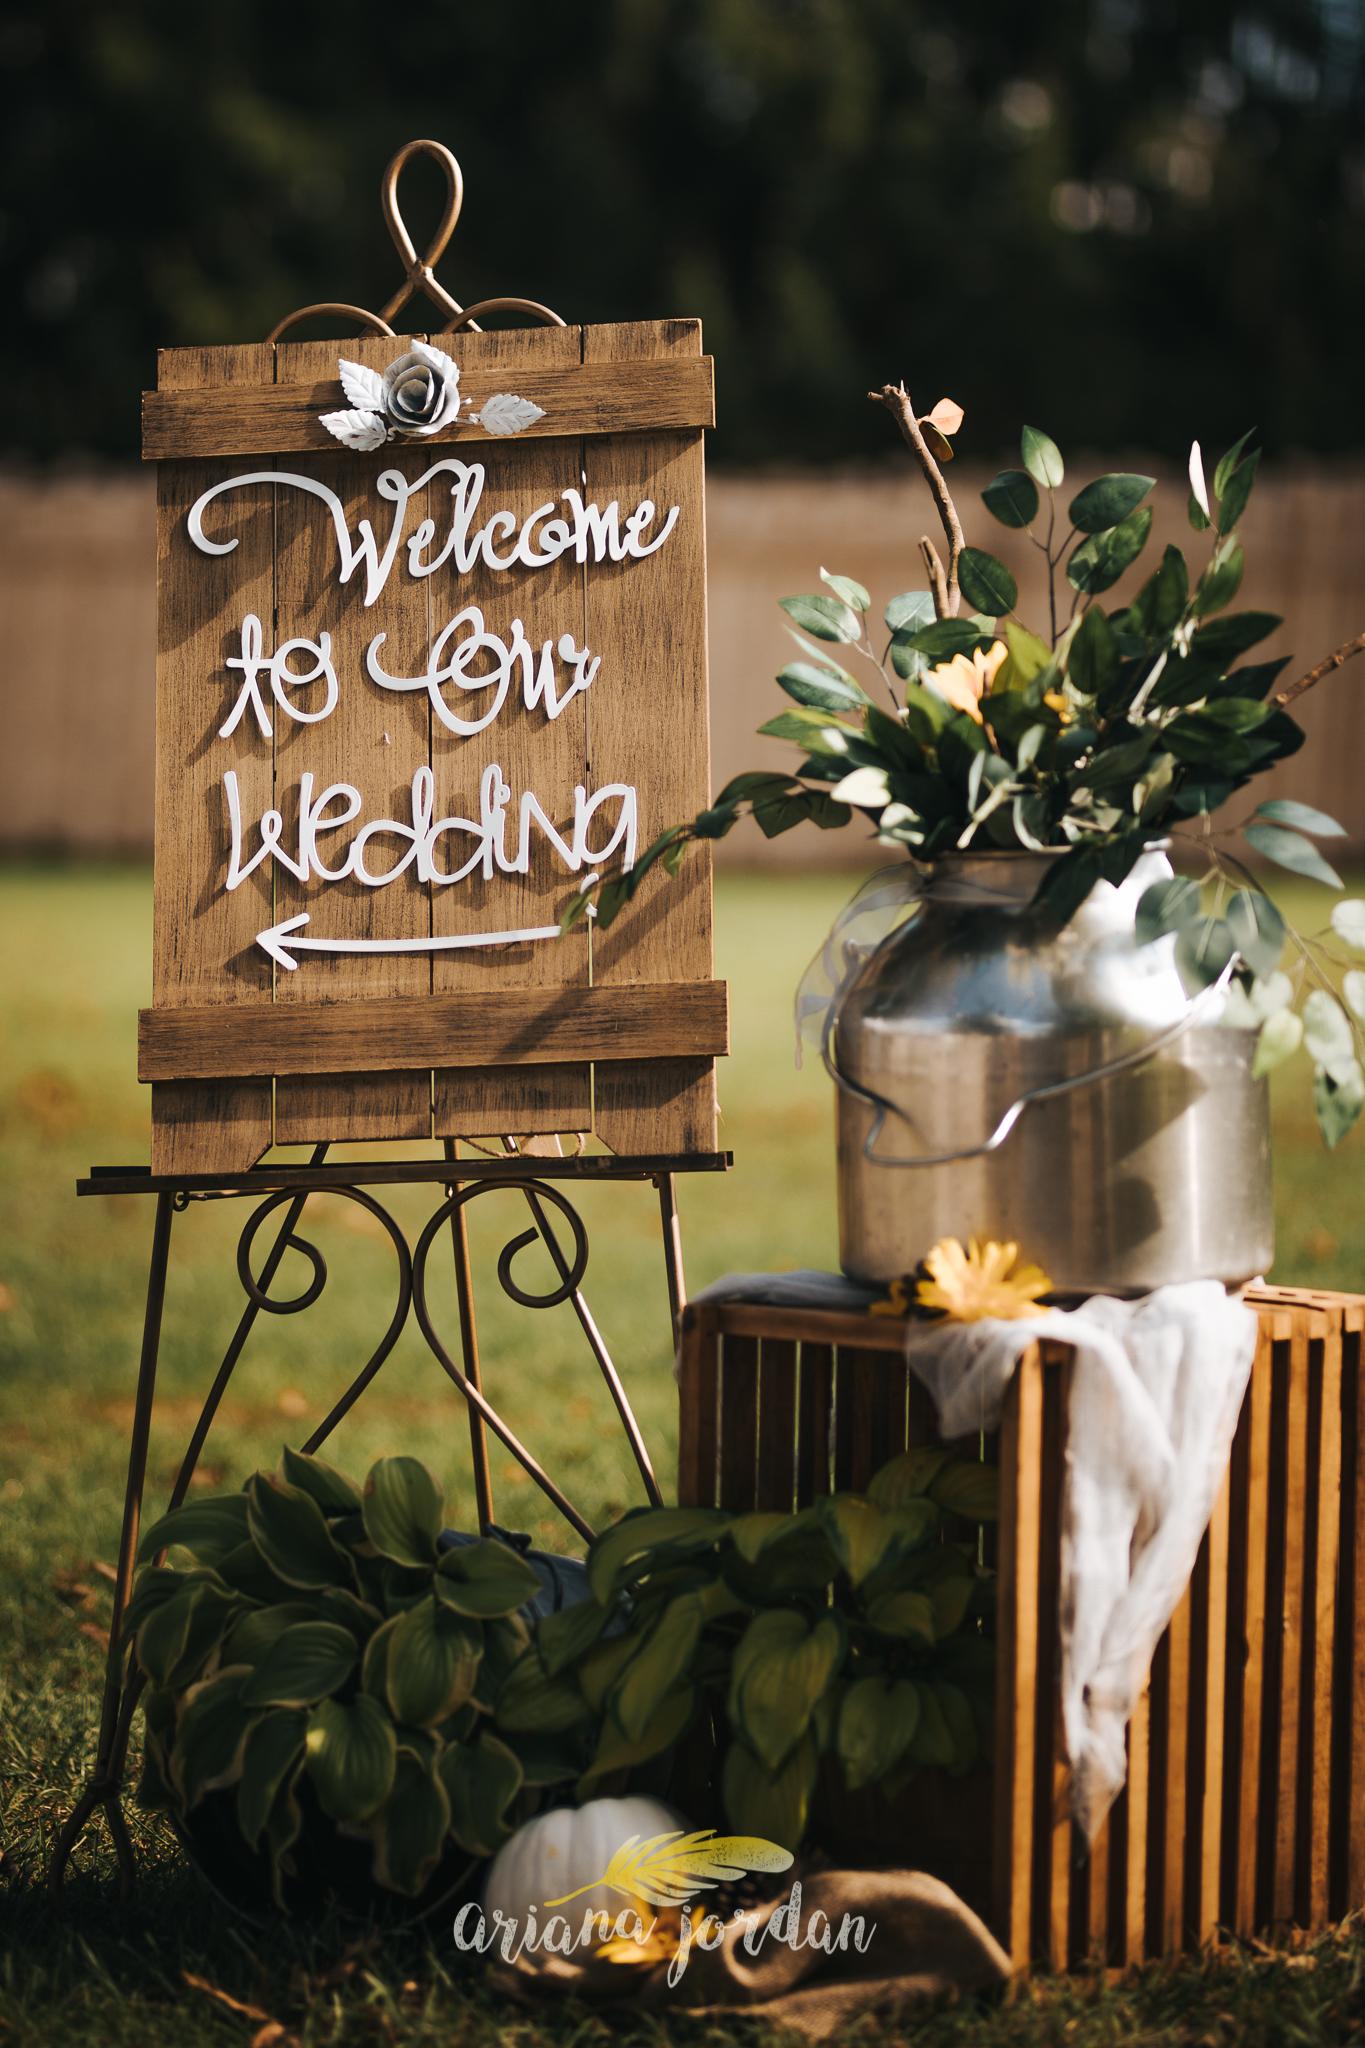 002 Ariana Jordan Photography -Moonlight Fields Lexington Ky Wedding Photographer 4047.jpg